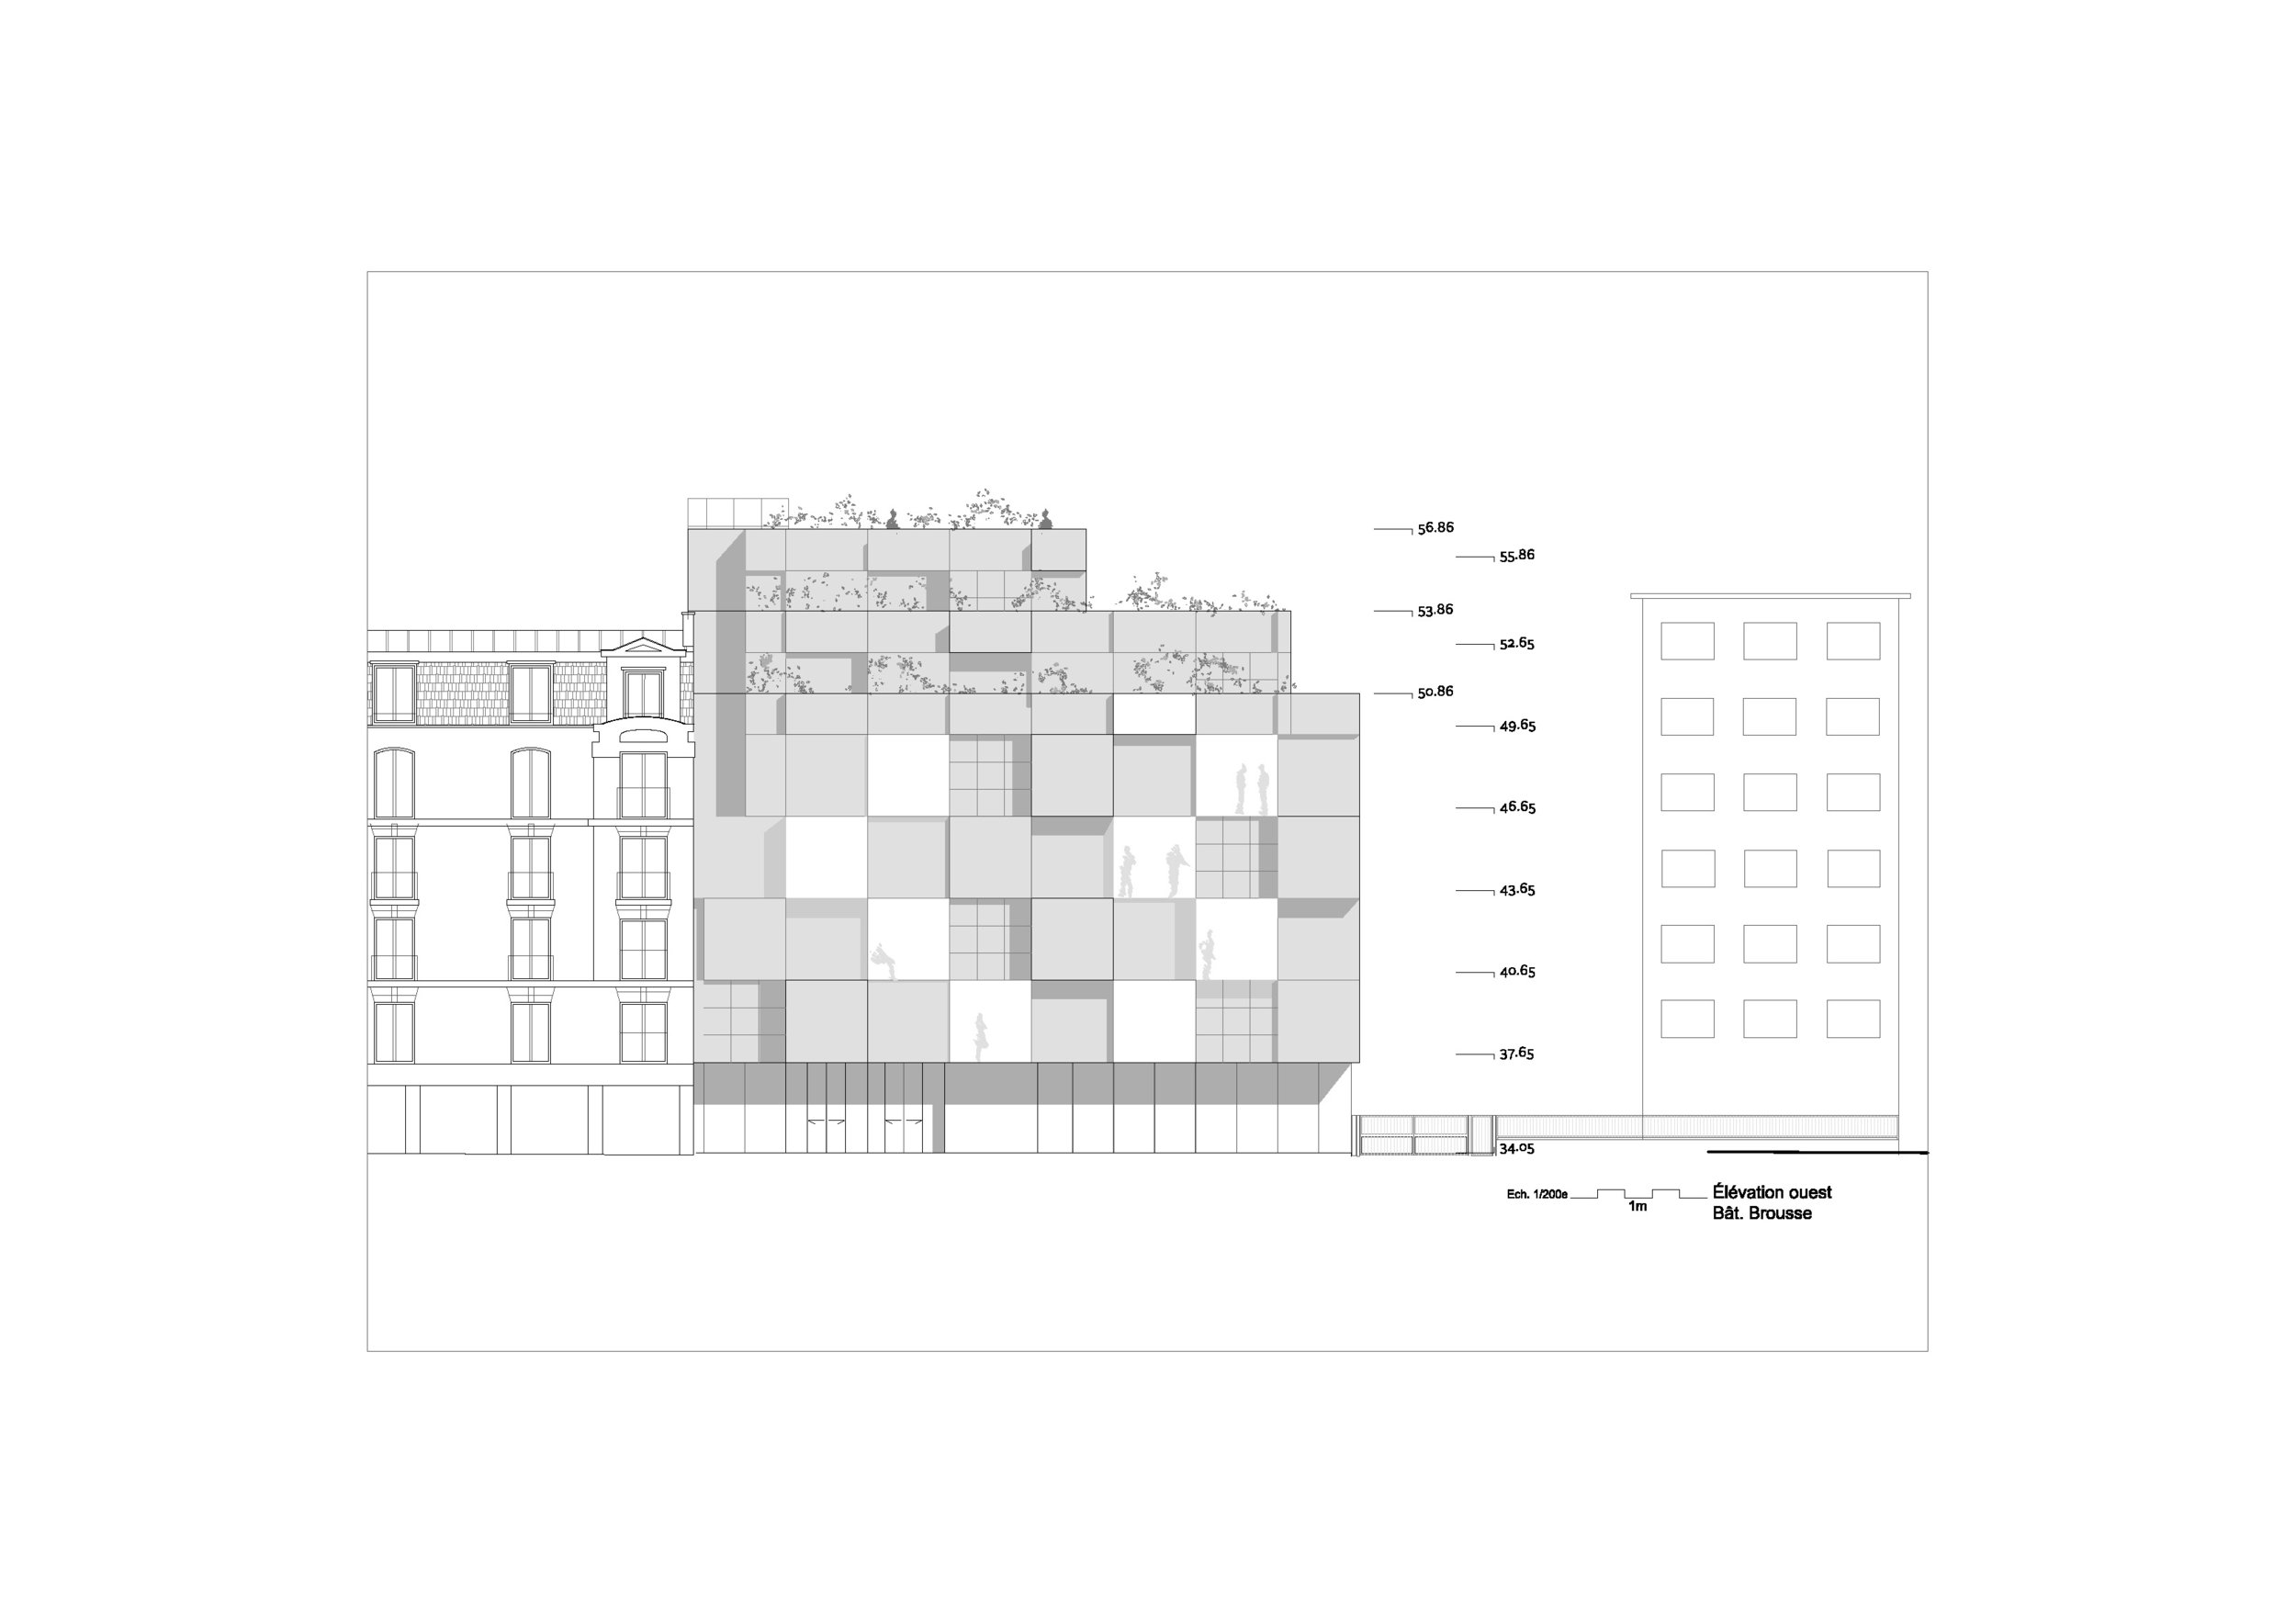 reinventer - paris- noc 42 - xavier - niel - ar - Studio - architectures - ecole 42   Kwame YAMGNANE nicolas sadirac - free (10).jpg